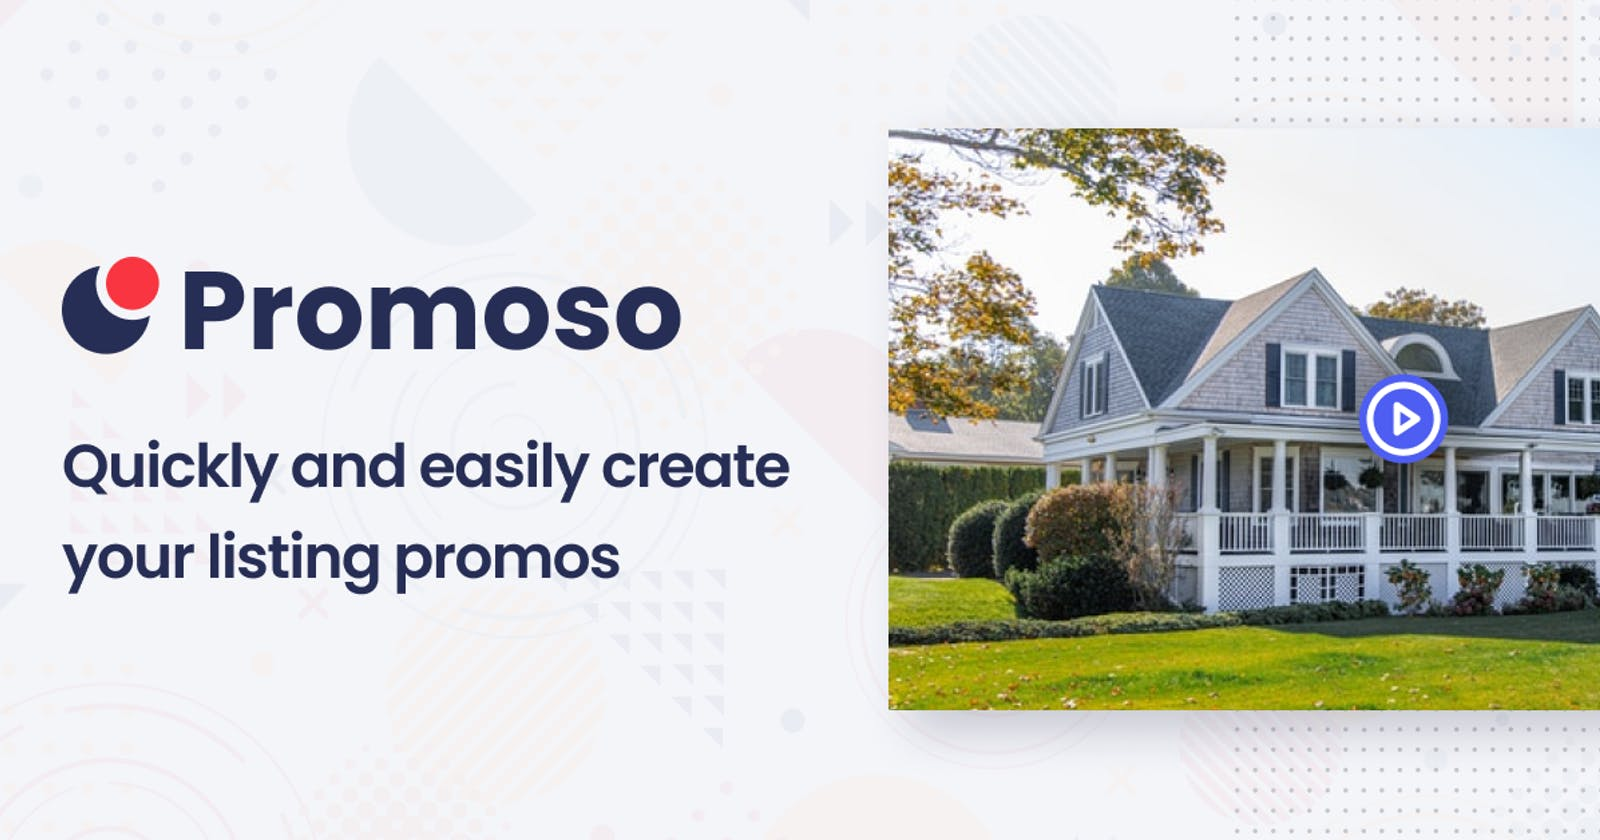 Promoso Update #1